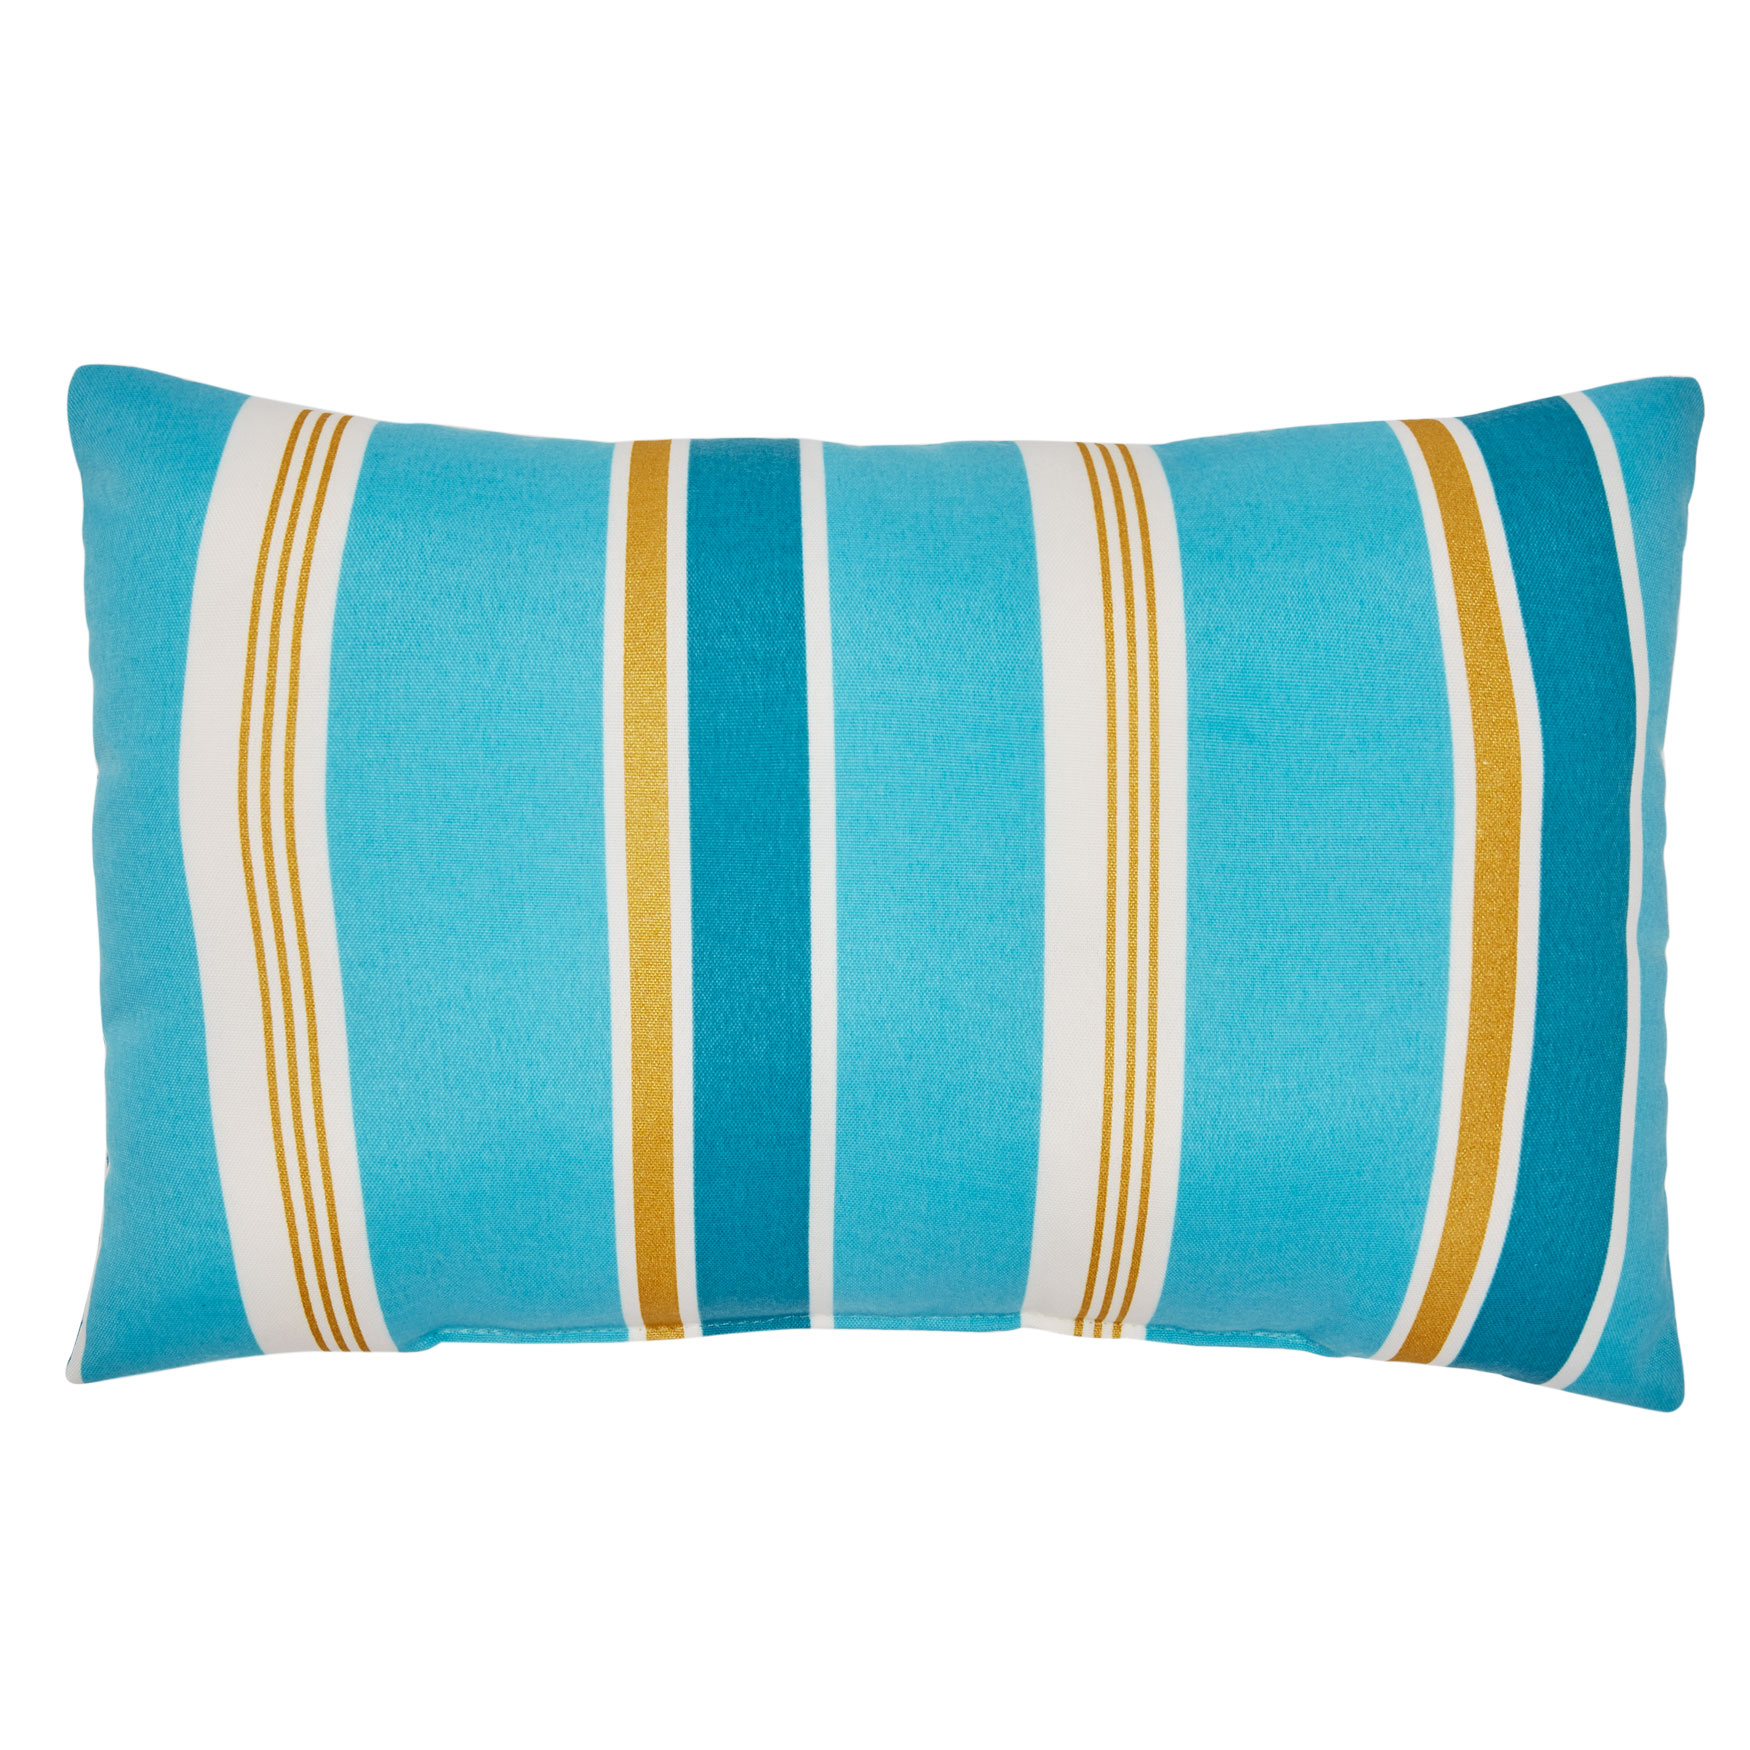 20 X 13 Lumbar Pillow Plus Size Decor Brylane Home